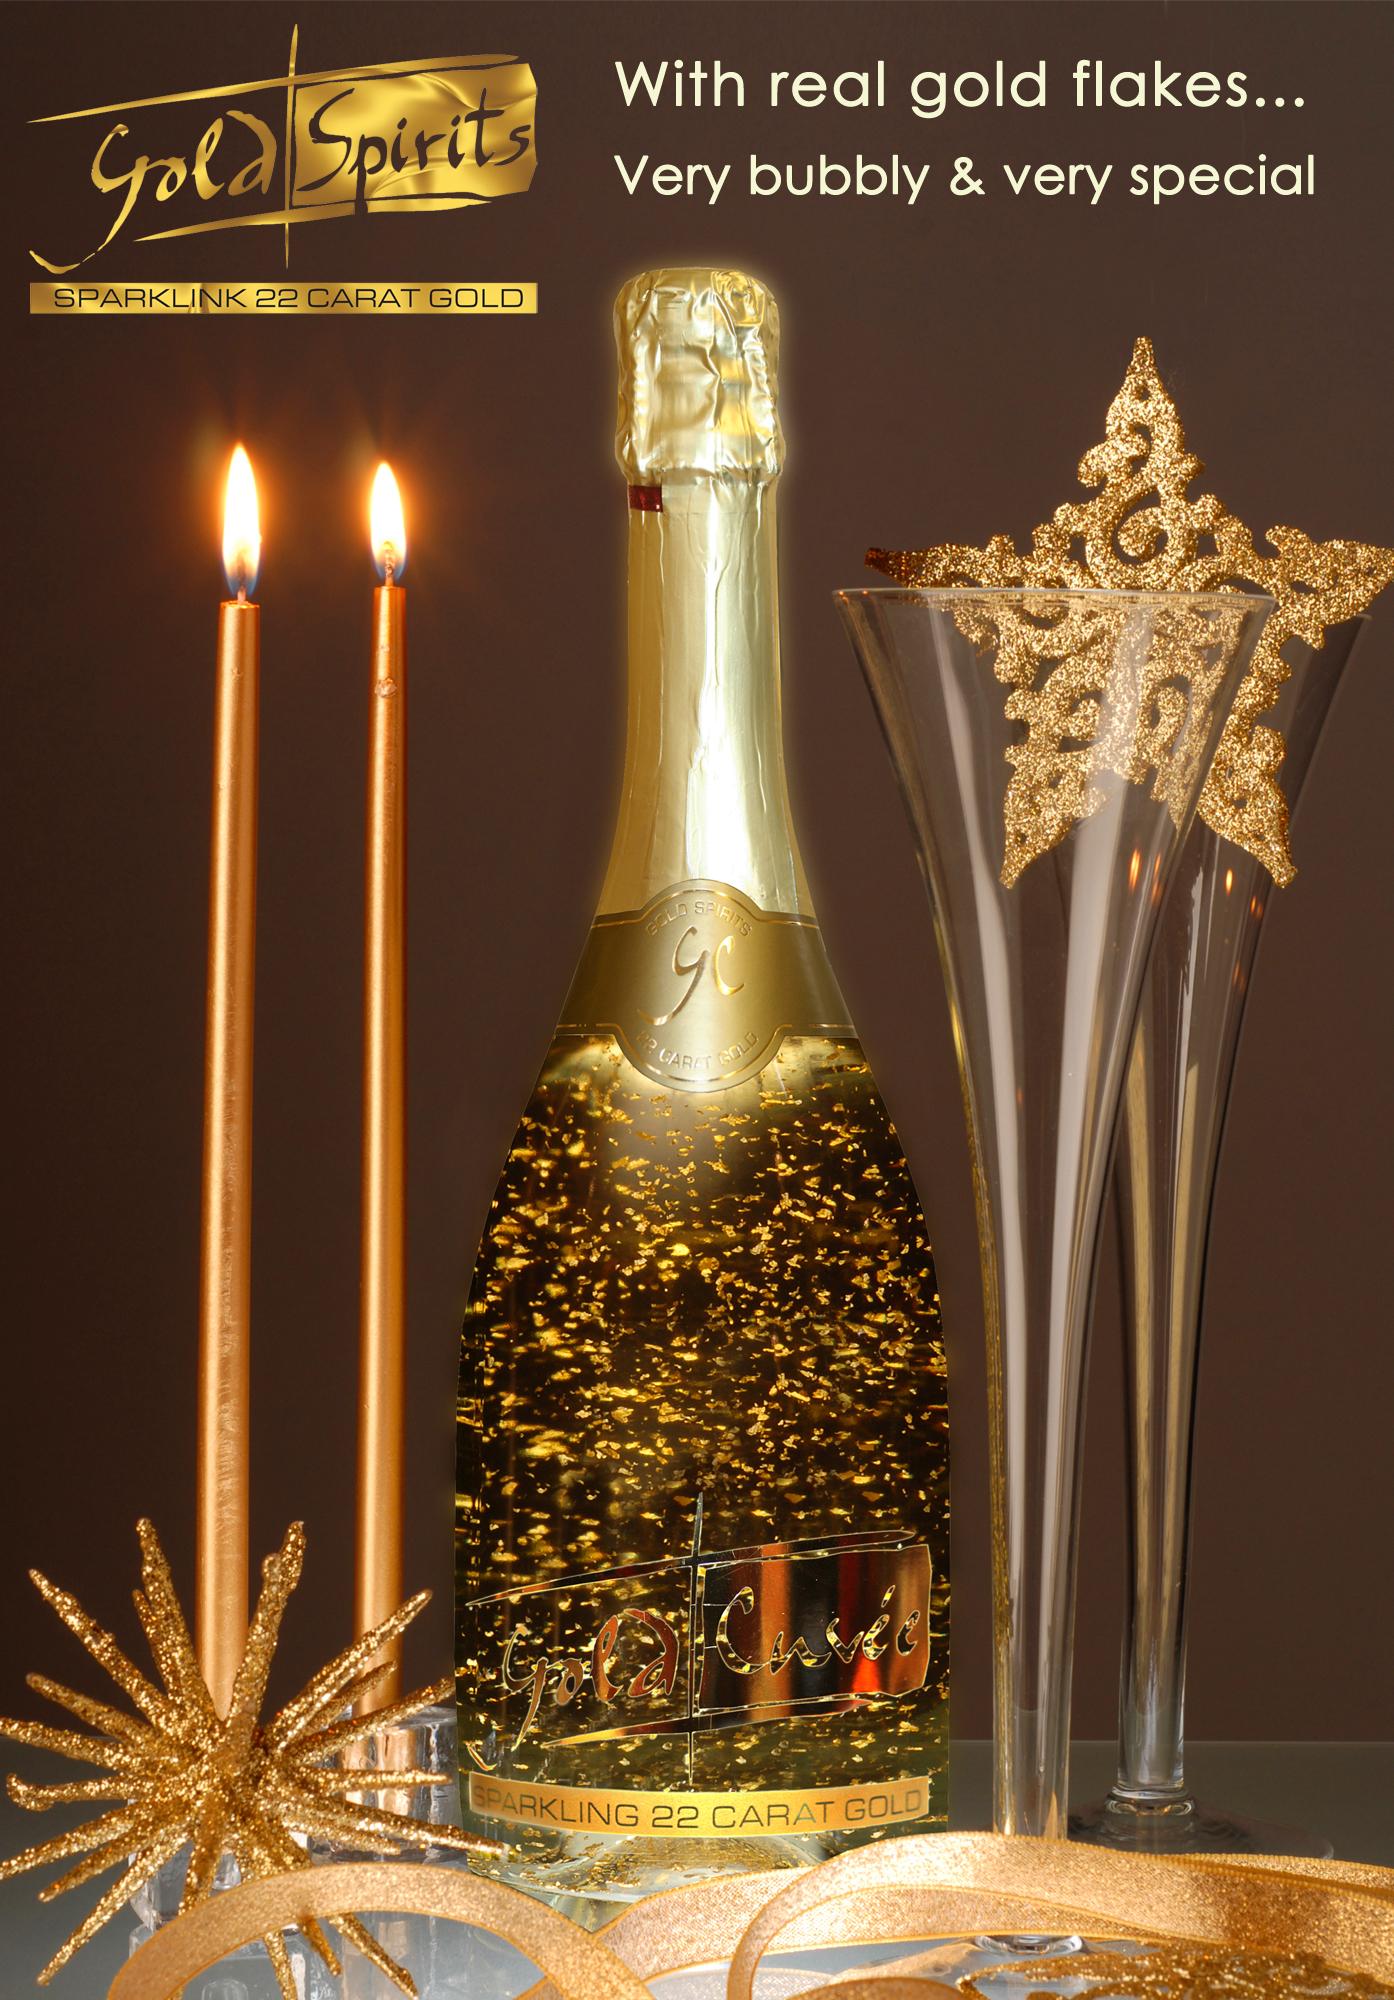 Sparkling Gold Cuvee